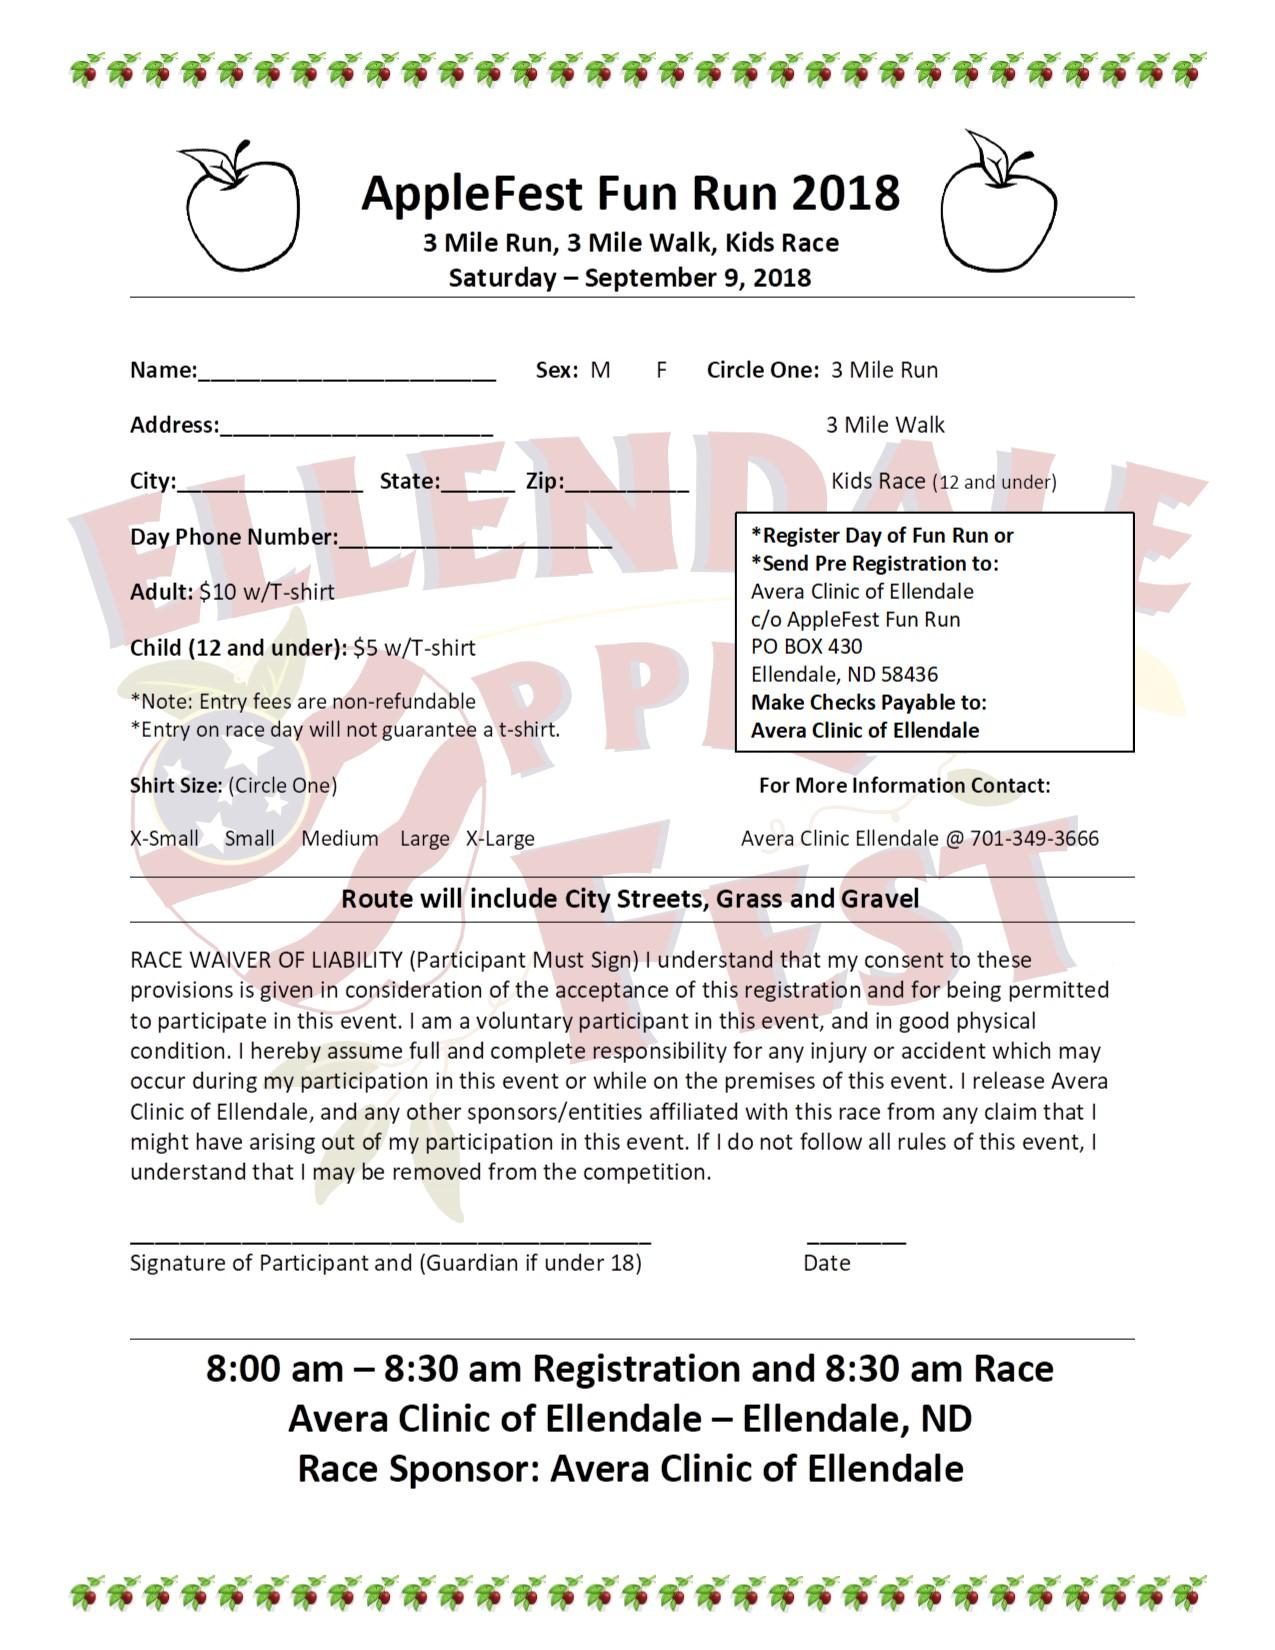 2015Applefest_Rainbow_Race_Registration_Form-page-001.jpg